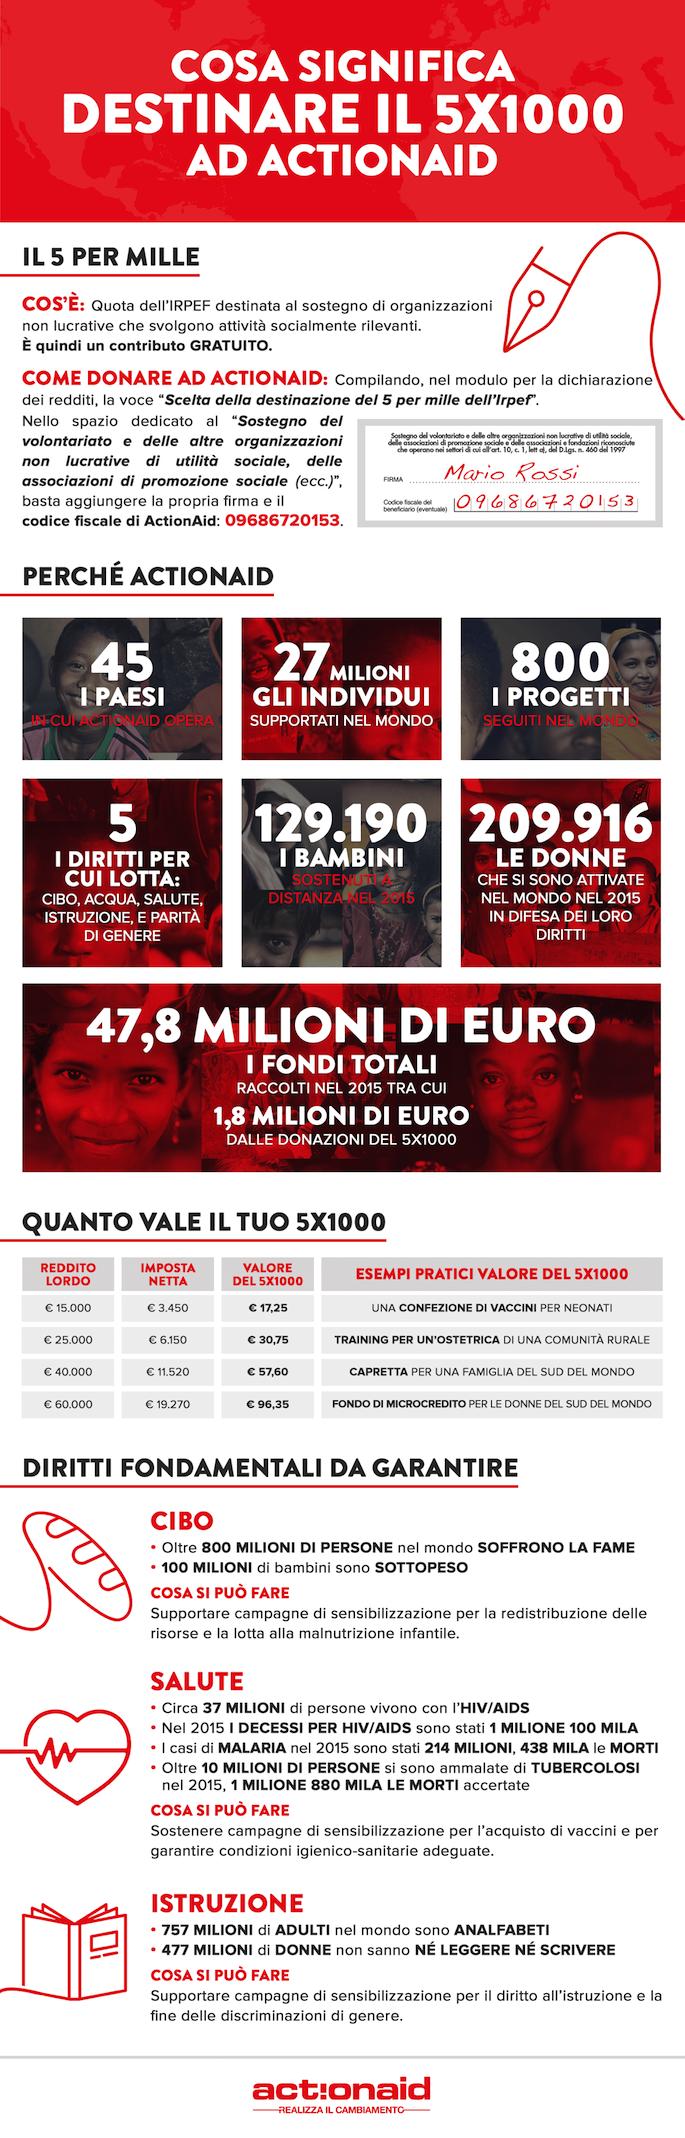 20170503_actionaid_5per1000_infografica